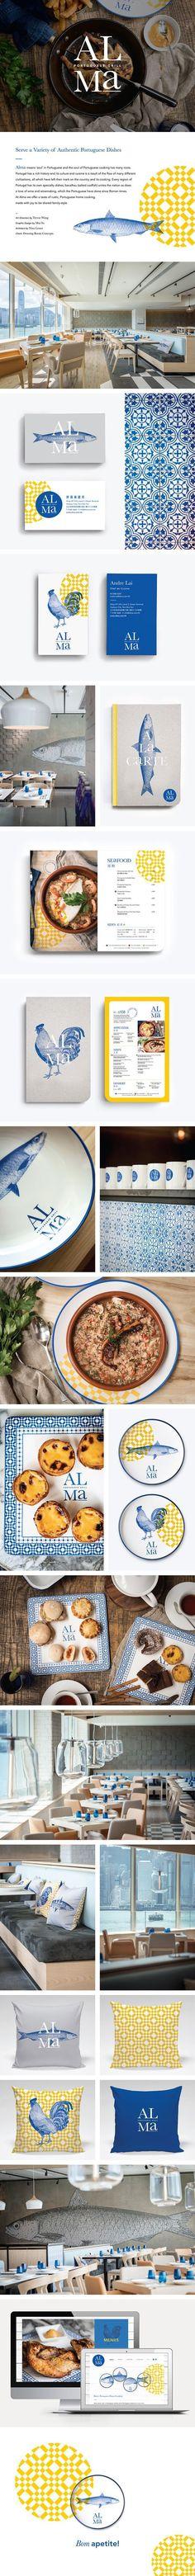 10 Restaurant Branding Identity Design